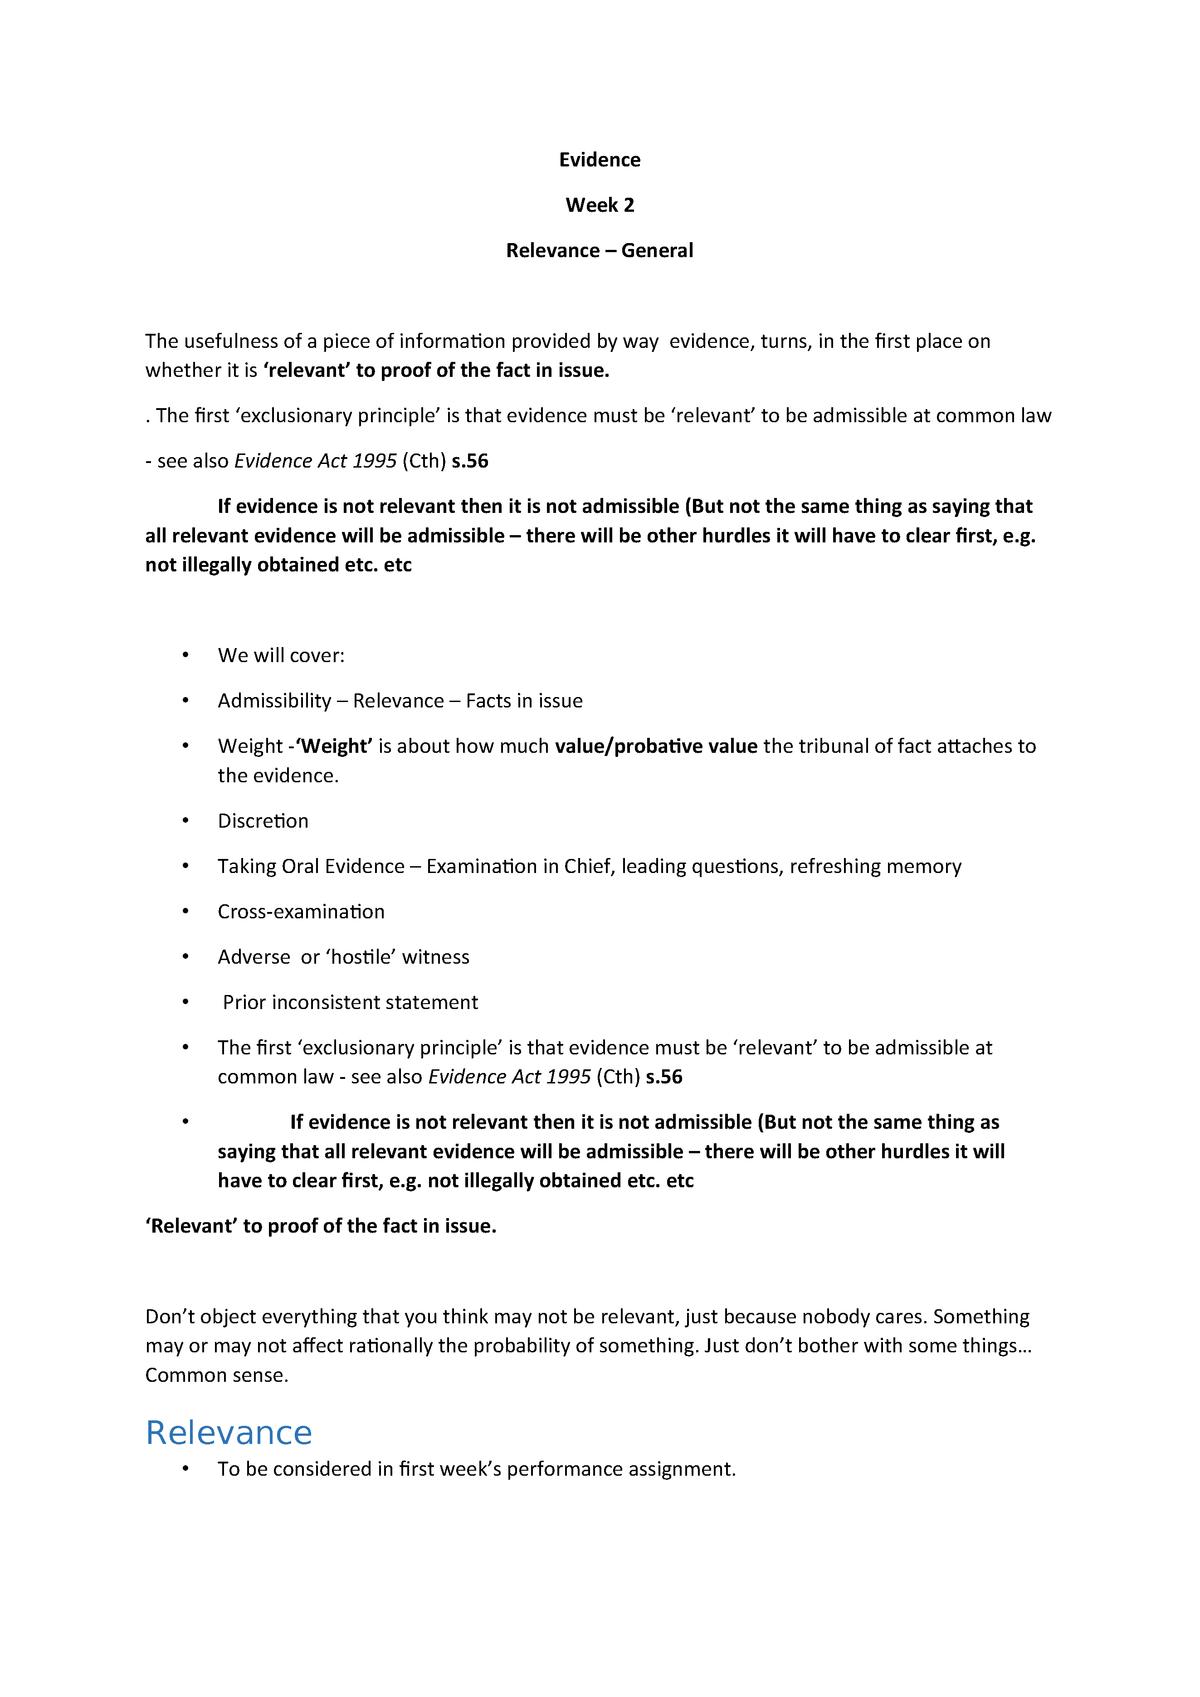 Evidence Week 2 - Relevance - LAW3106: Evidence - StuDocu